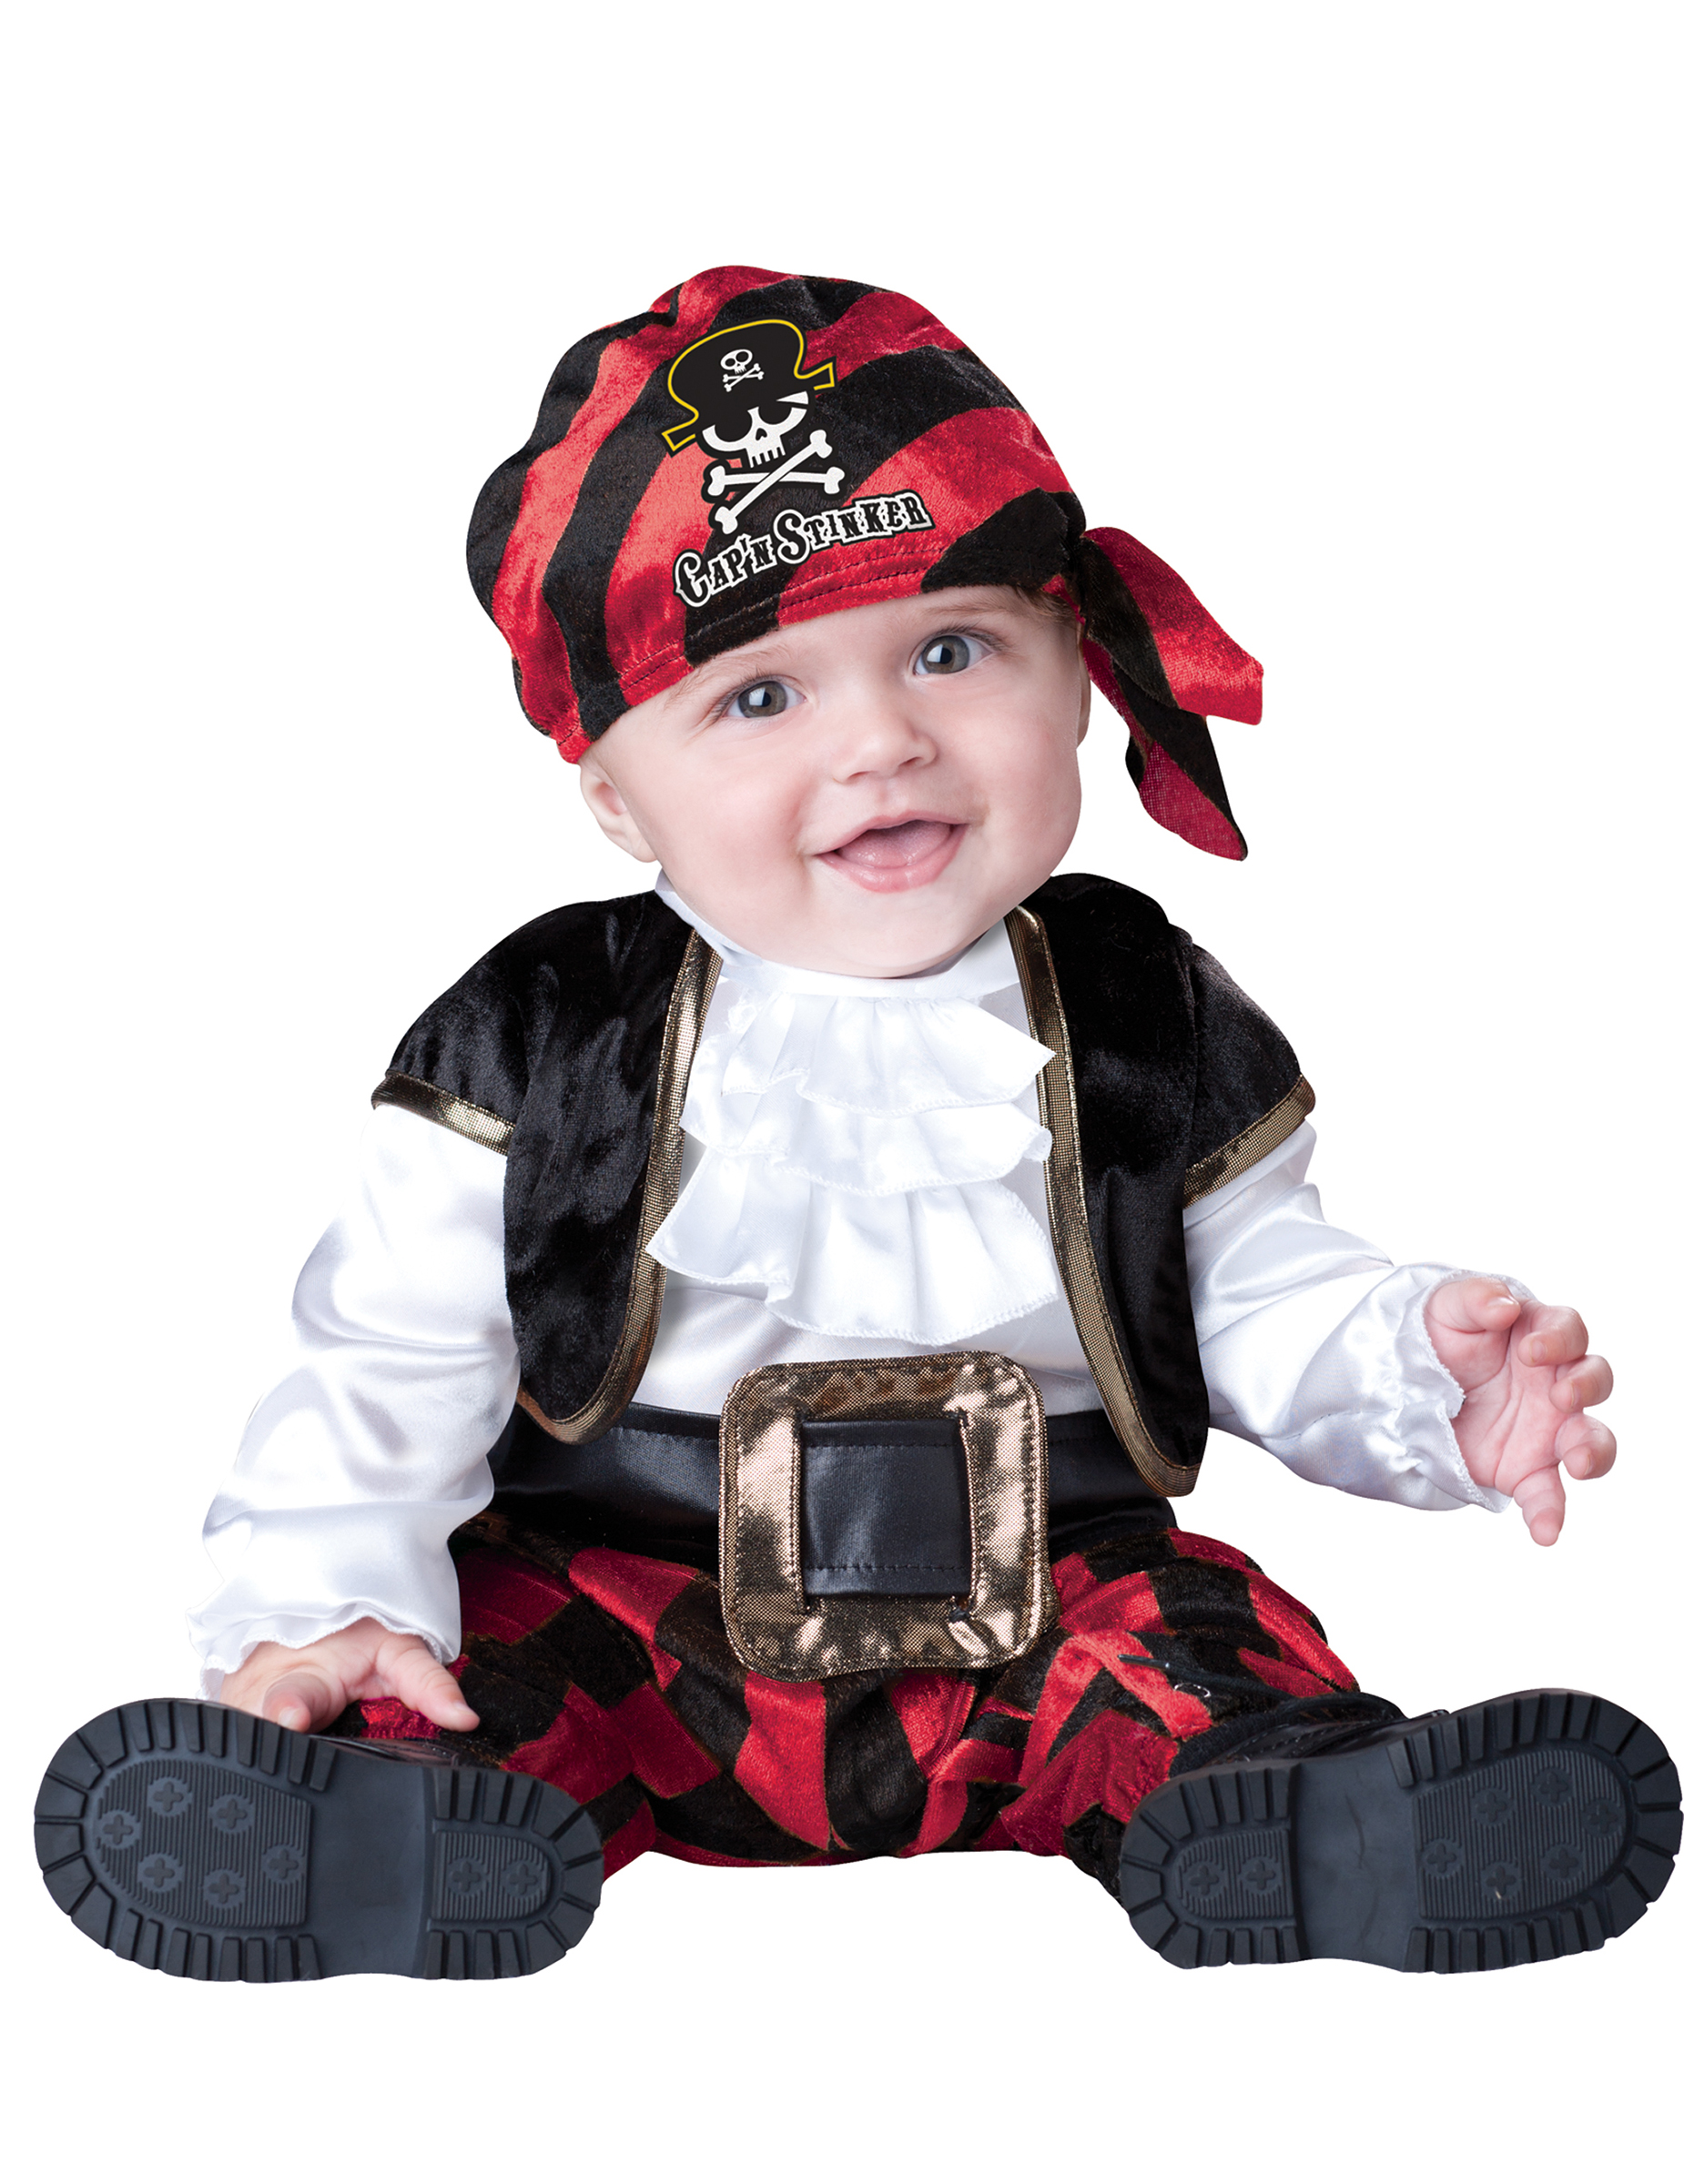 Da Pirati Feste Vestiti Maschera Per Carnevale In Bambini E 5Rx7q1d7 8edb0042128